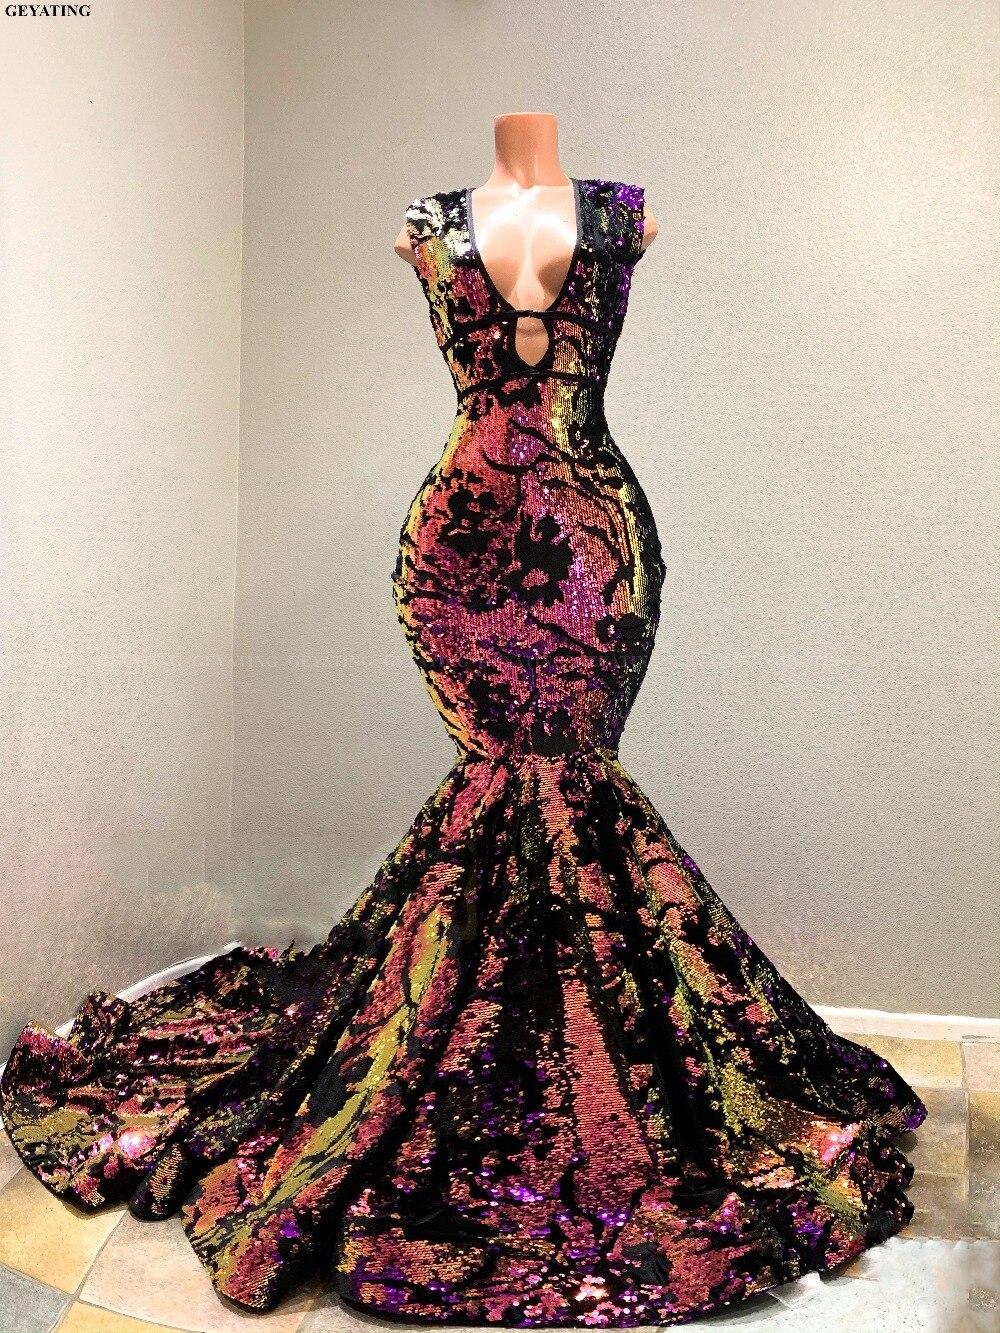 Sparkly Sequin Velvet Mermaid African Prom Dresses 2019 Vestidos de gala Sexy V-Neck Court Train Black Girls Evening Party Dress